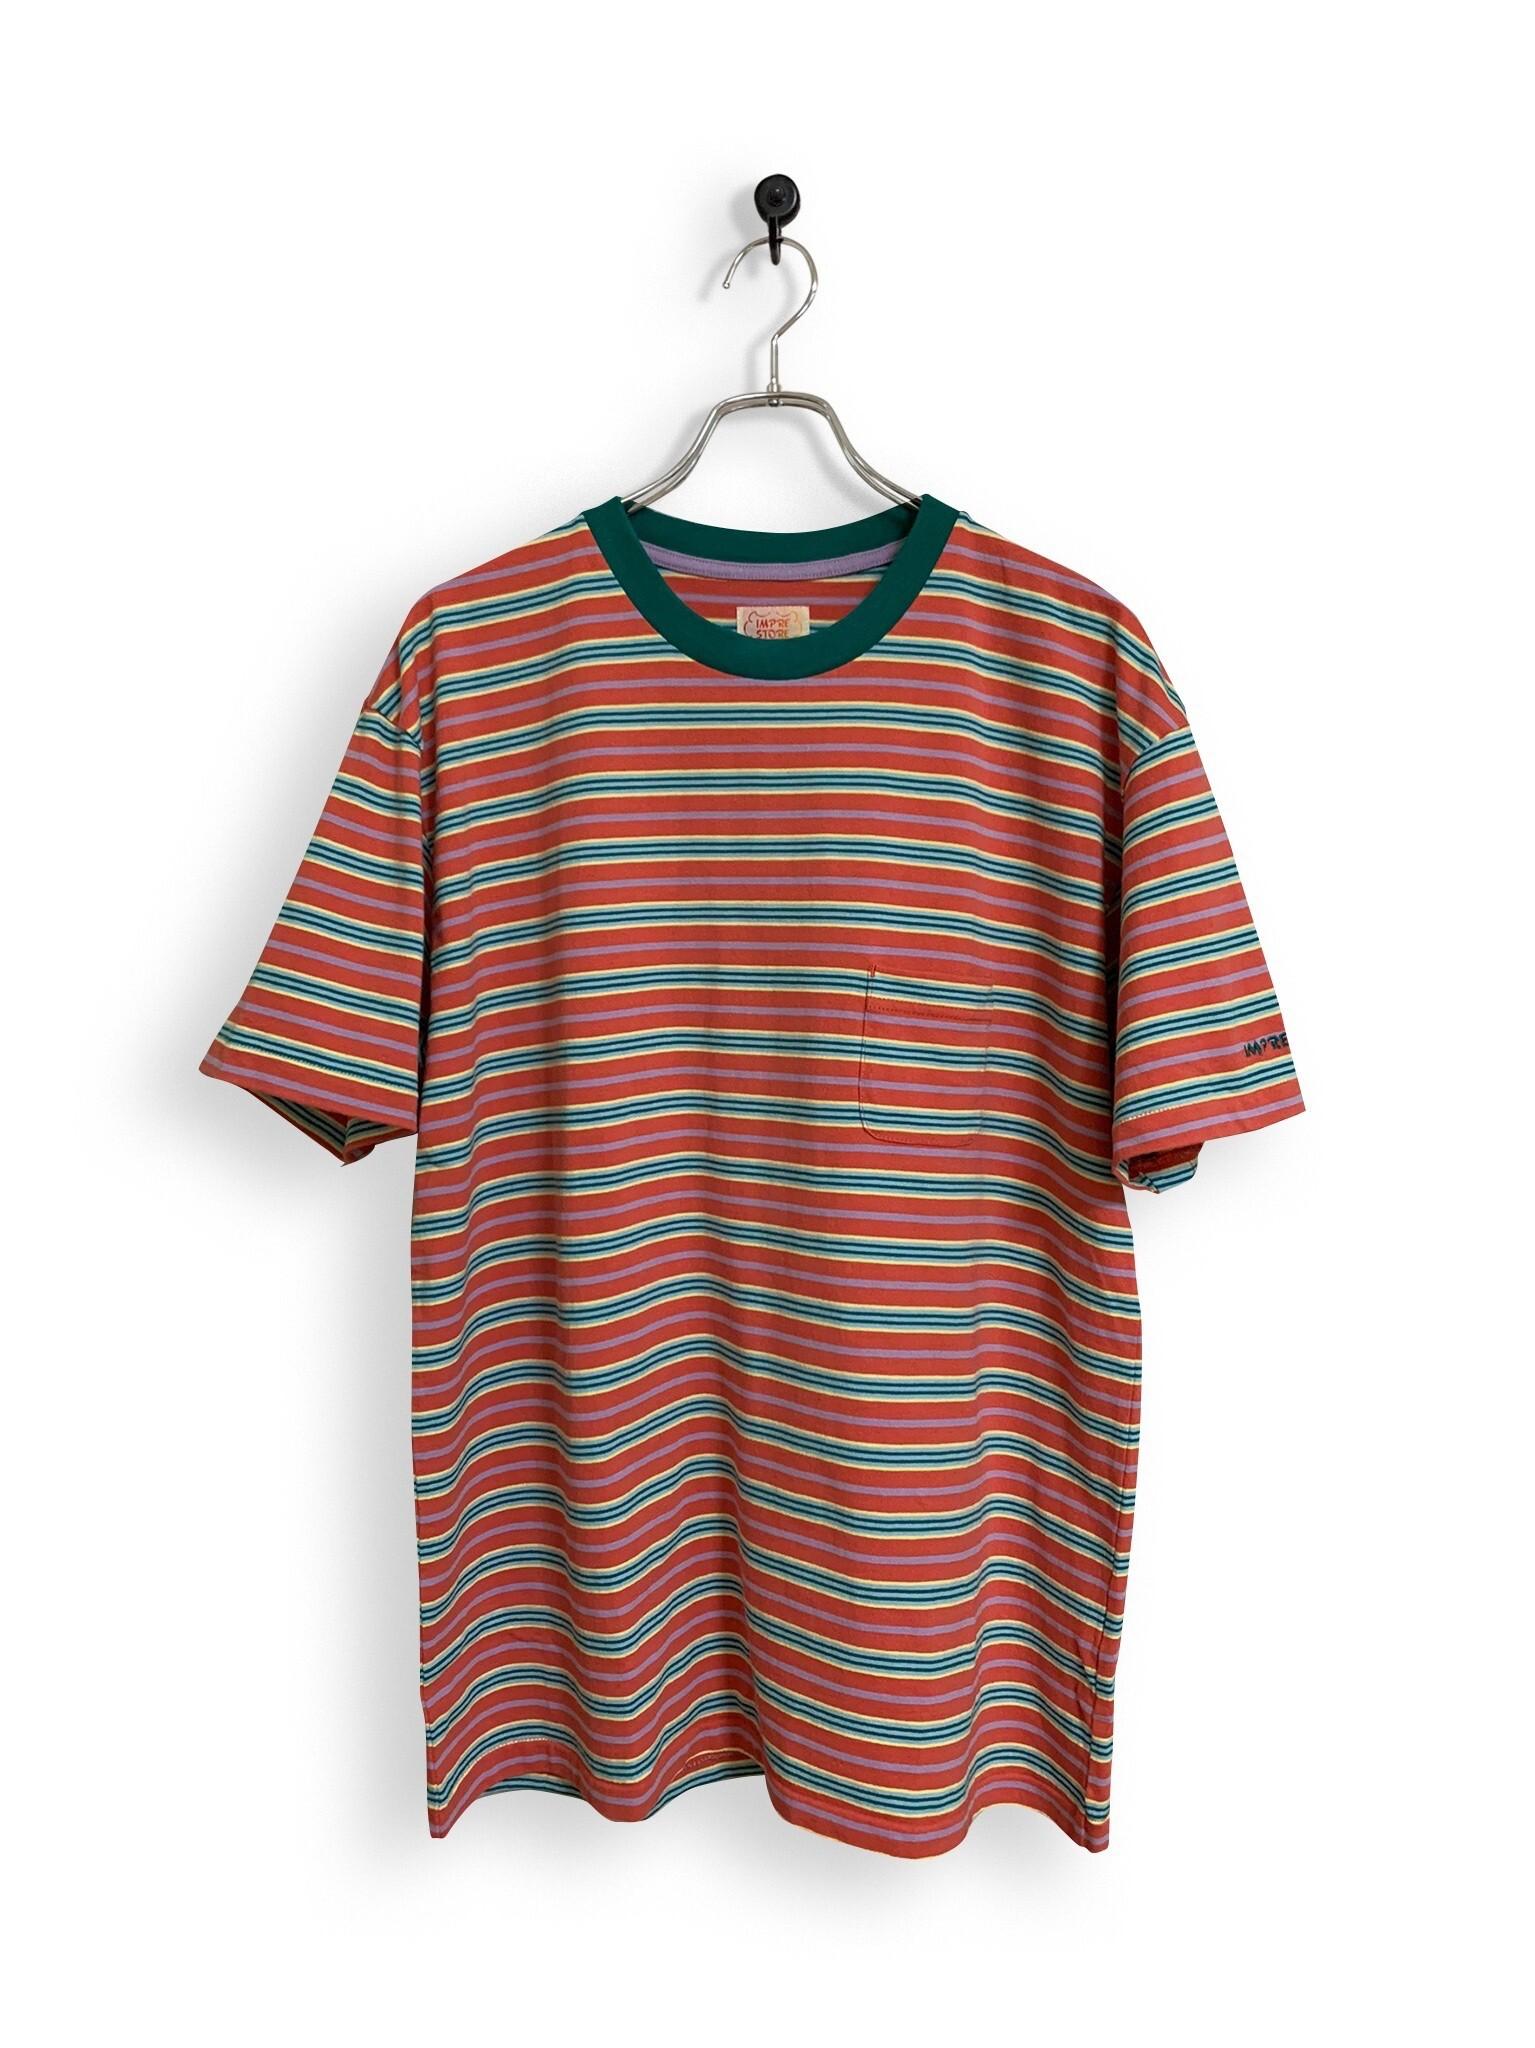 Original Multiborder Tshirt / red